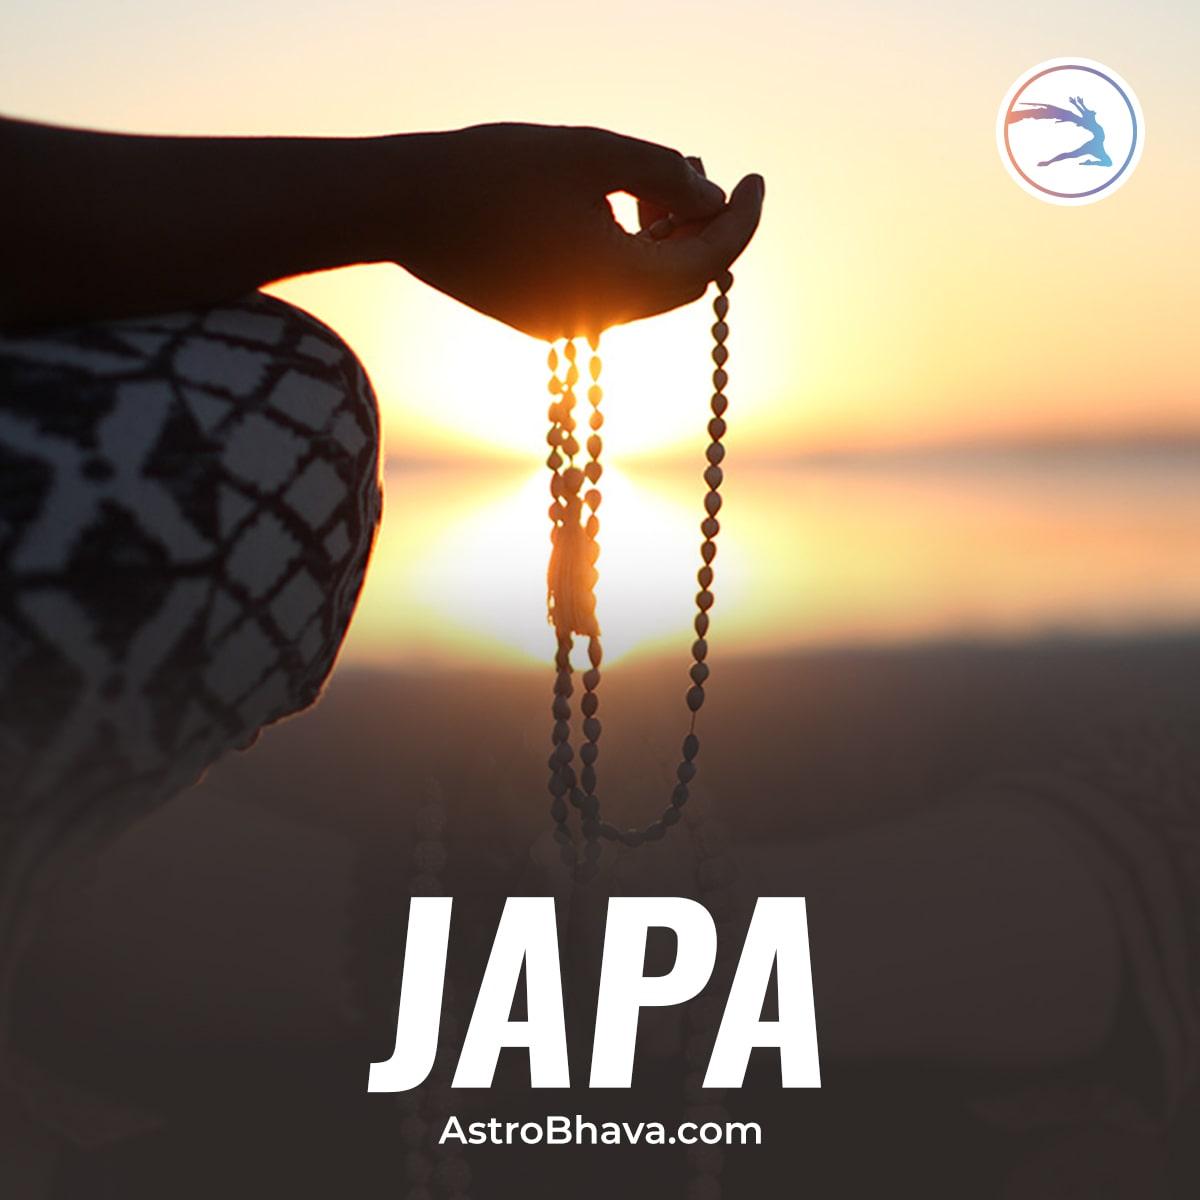 Mantra Japa - Hindu Vedic Approach to Dissociate from Negativities